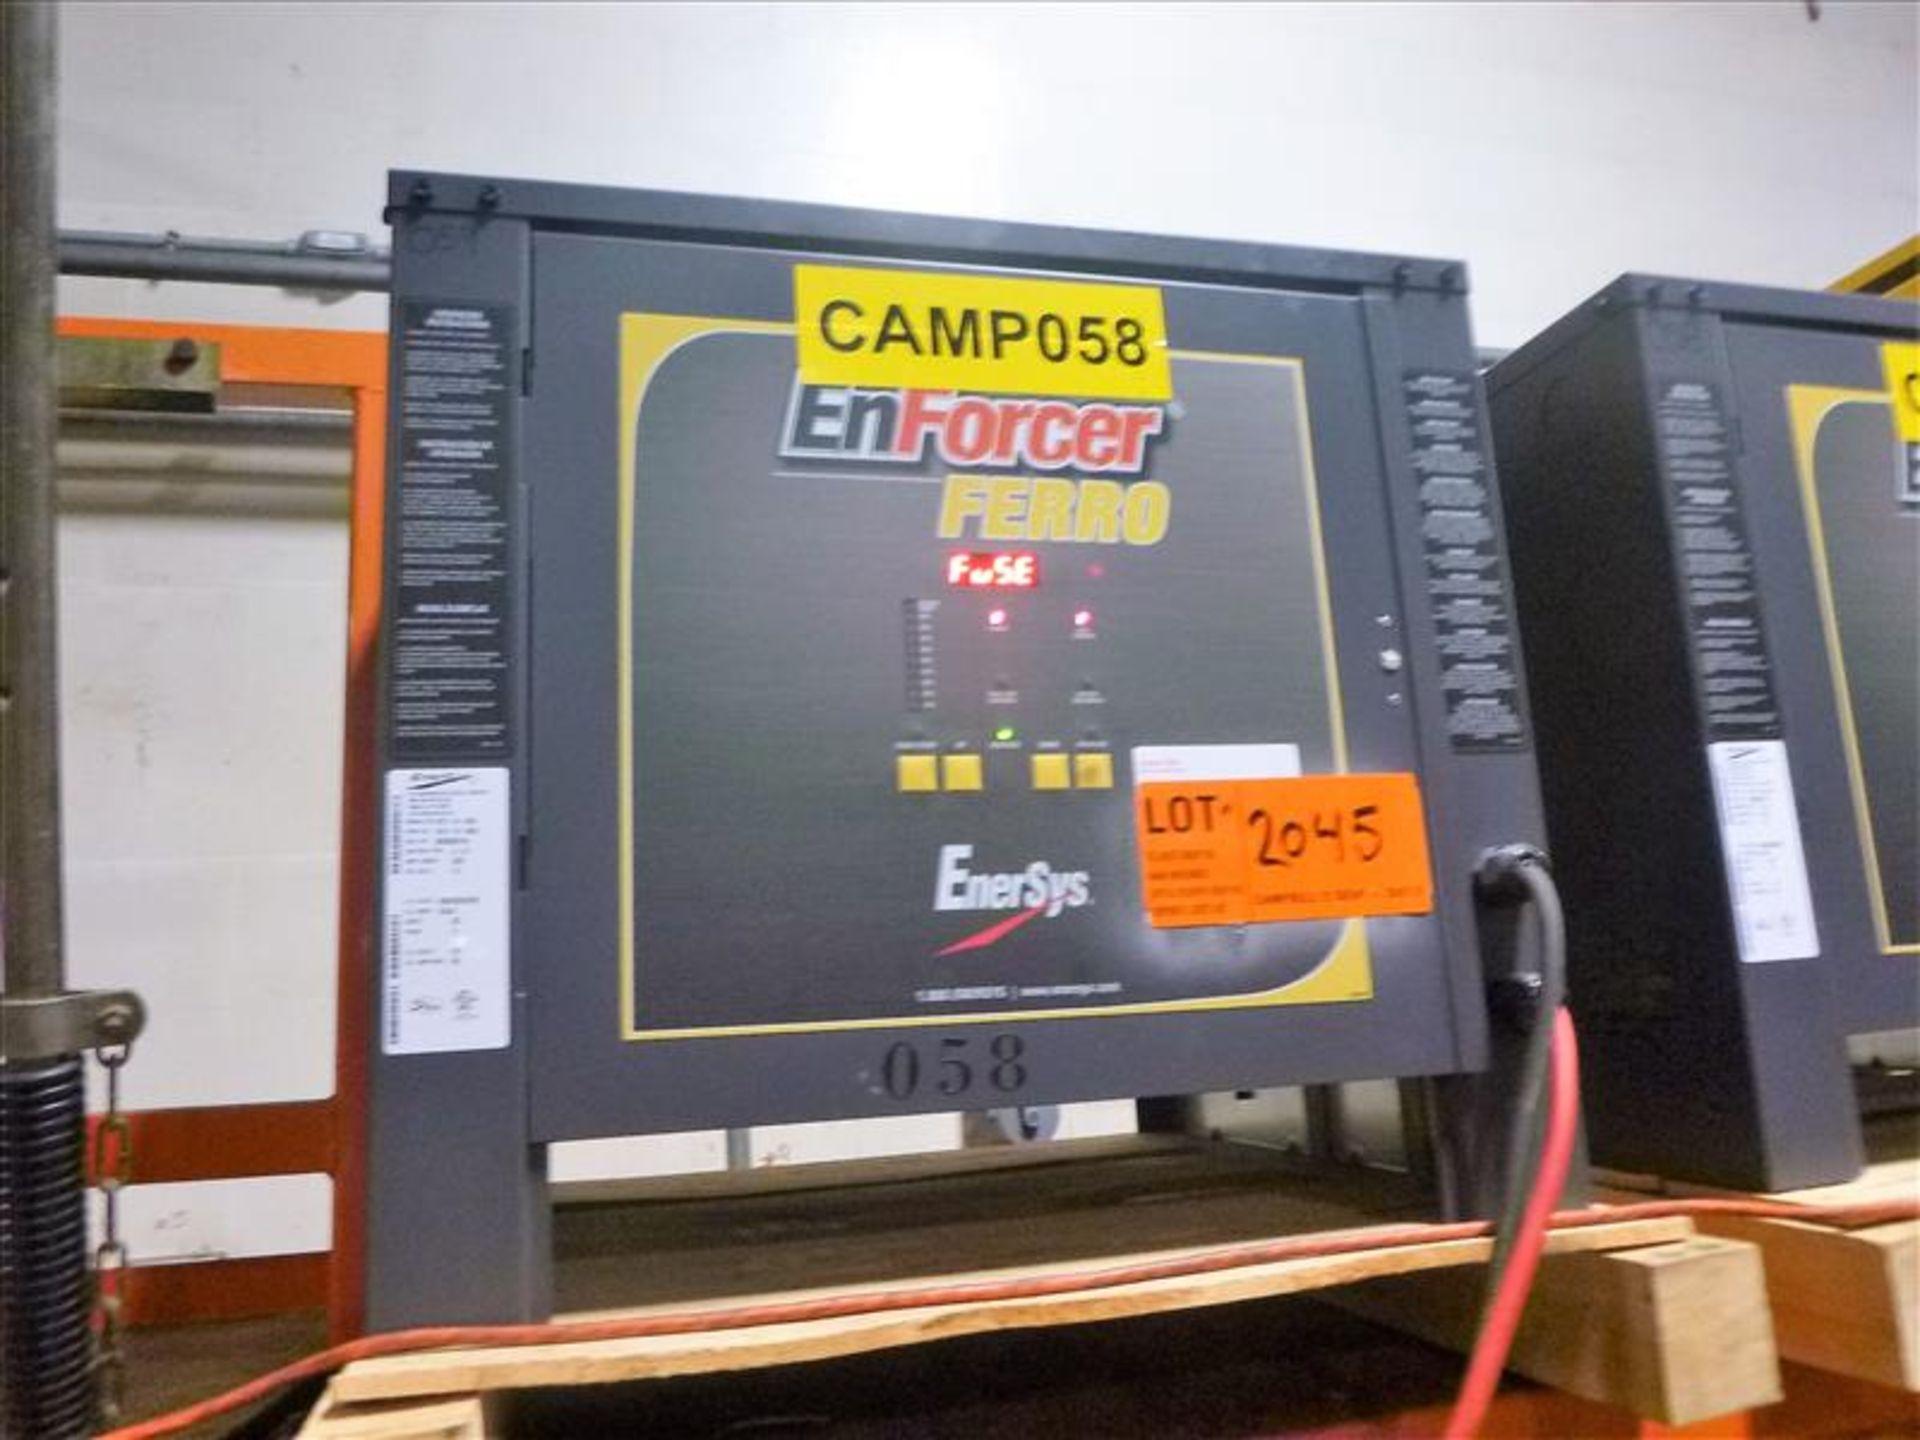 Enforcer Ferro battery charger, 24V [Material Handling]